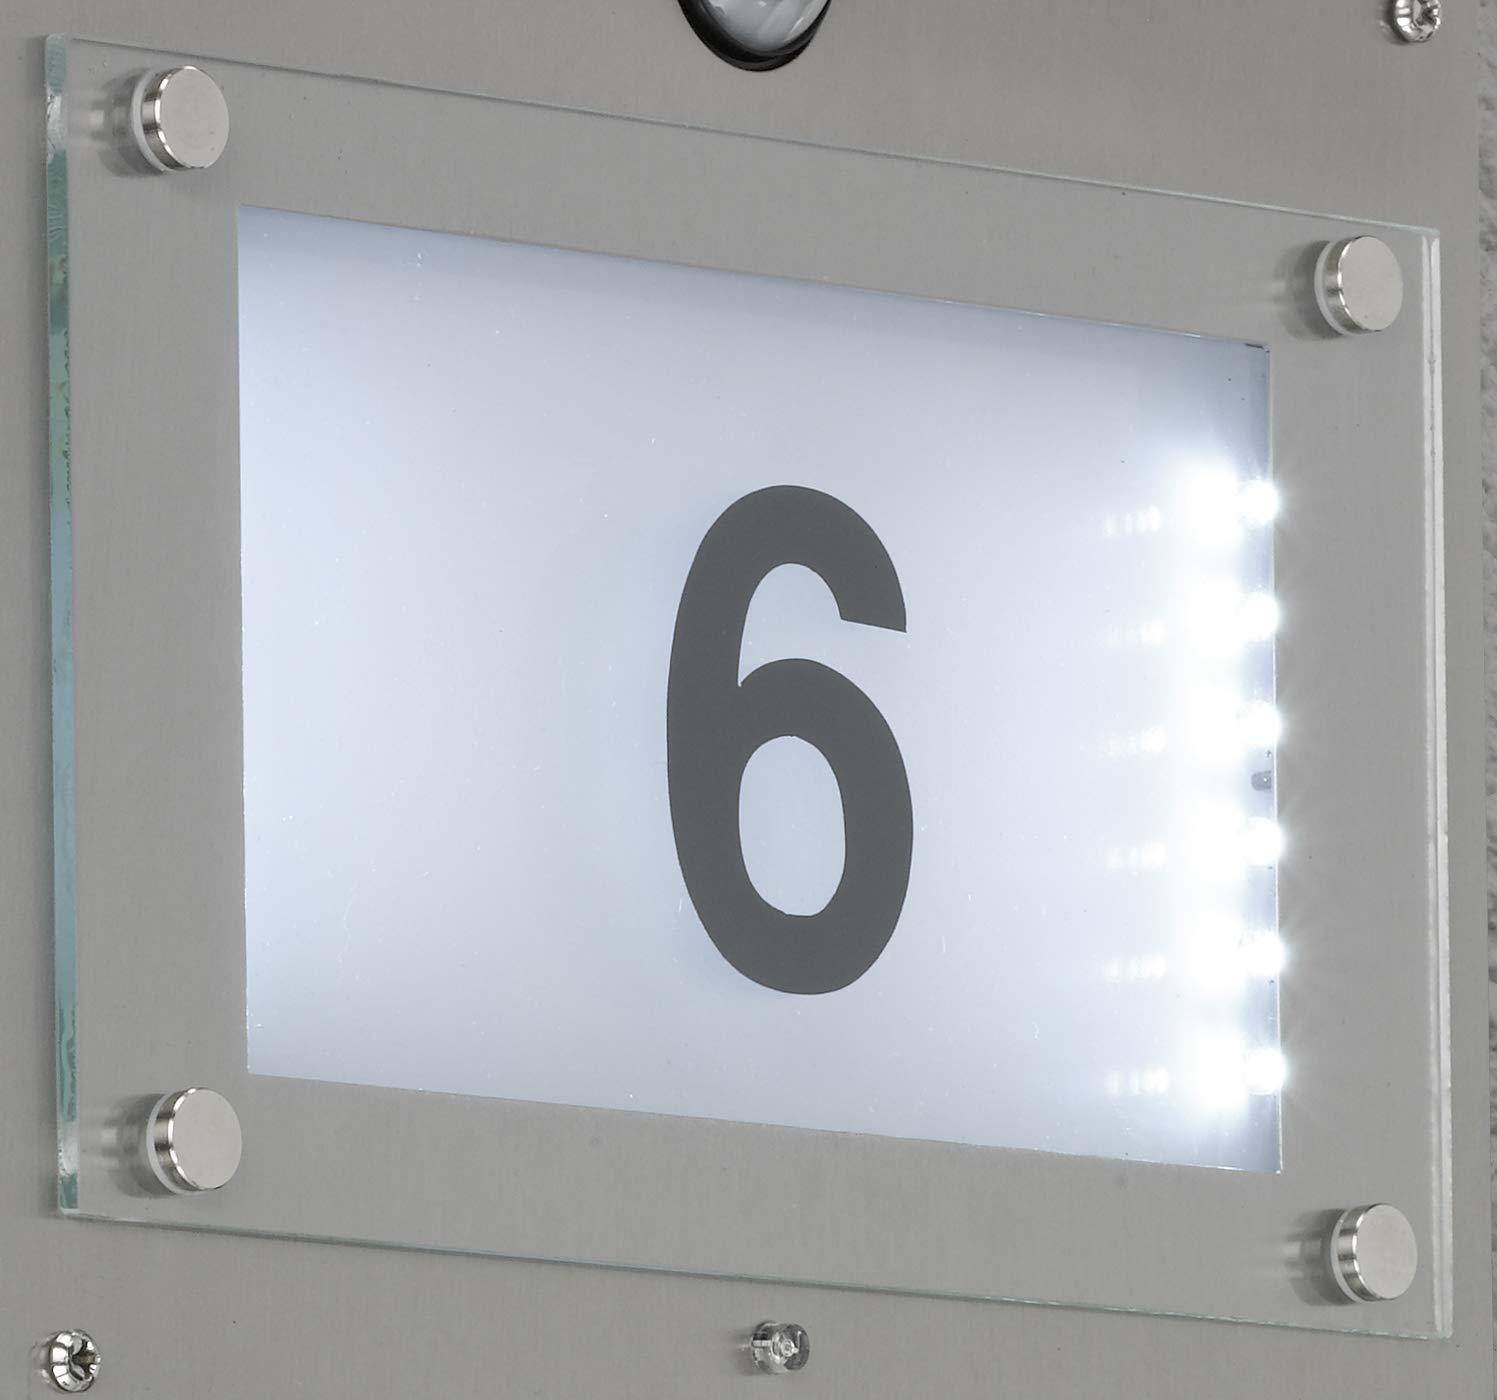 14.7 W Metall E27 Edelstahl Geb/ürstet Roh 12.5 x 22 x 32 cm WOFI Hausnummernleuchte